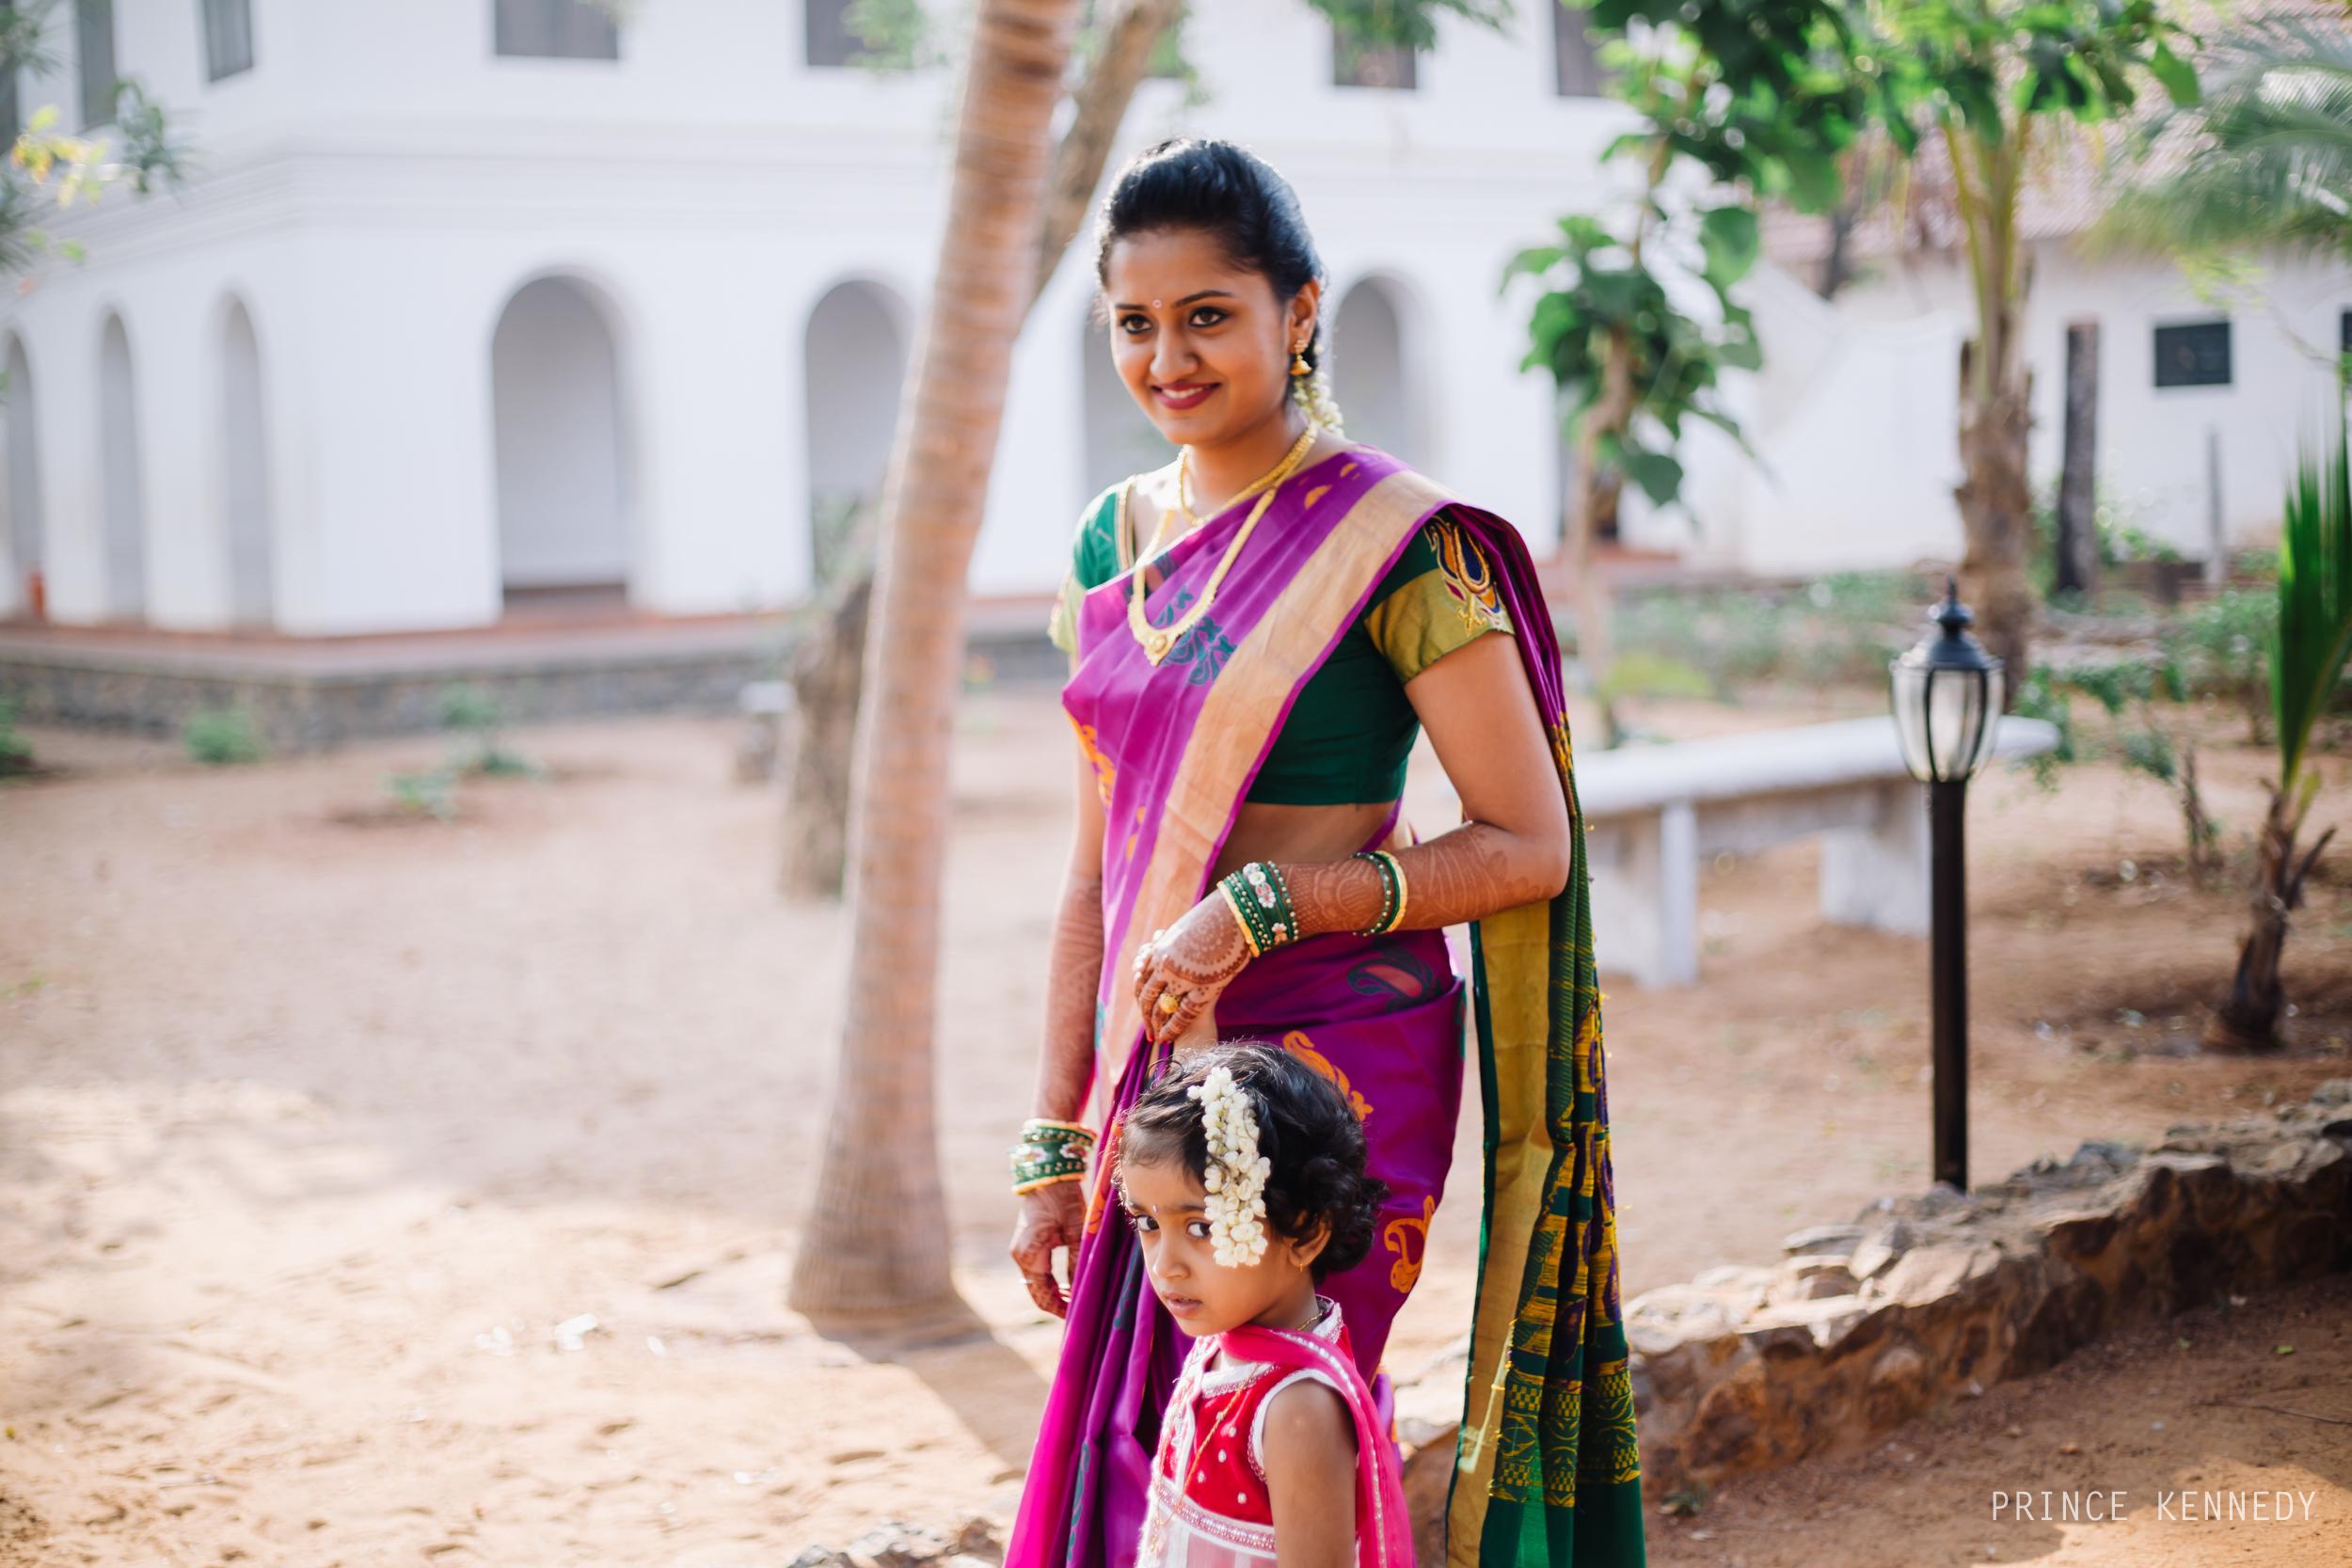 Athmajja-Nithesh-Engagement-Couple-Portrait-Portraiture-Wedding-Couple-Portrait-Chennai-Photographer-Candid-Photography-Destination-Best-Prince-Kennedy-Photography-27.jpg